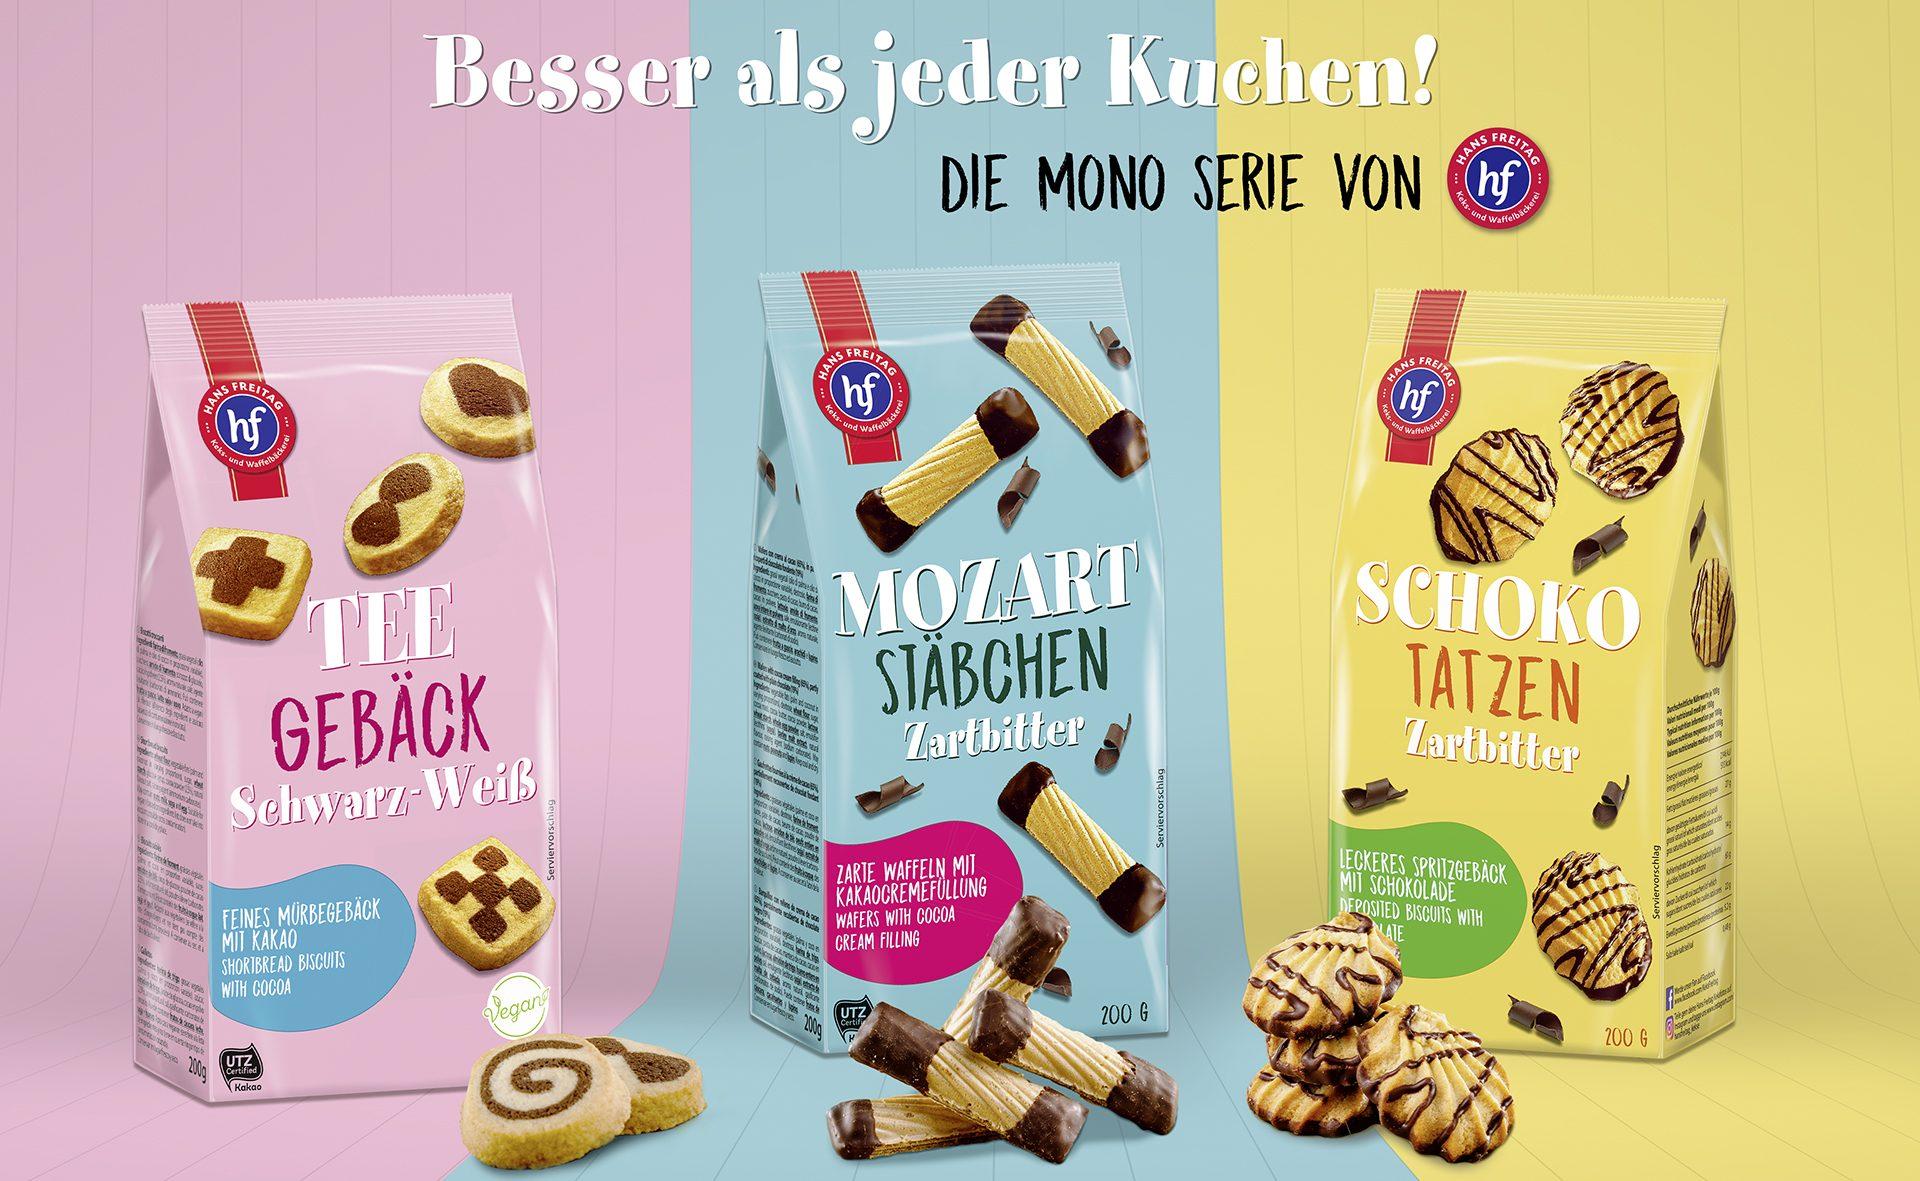 Verpackungsdesign Malvega: Hans Freitag, Gebäck